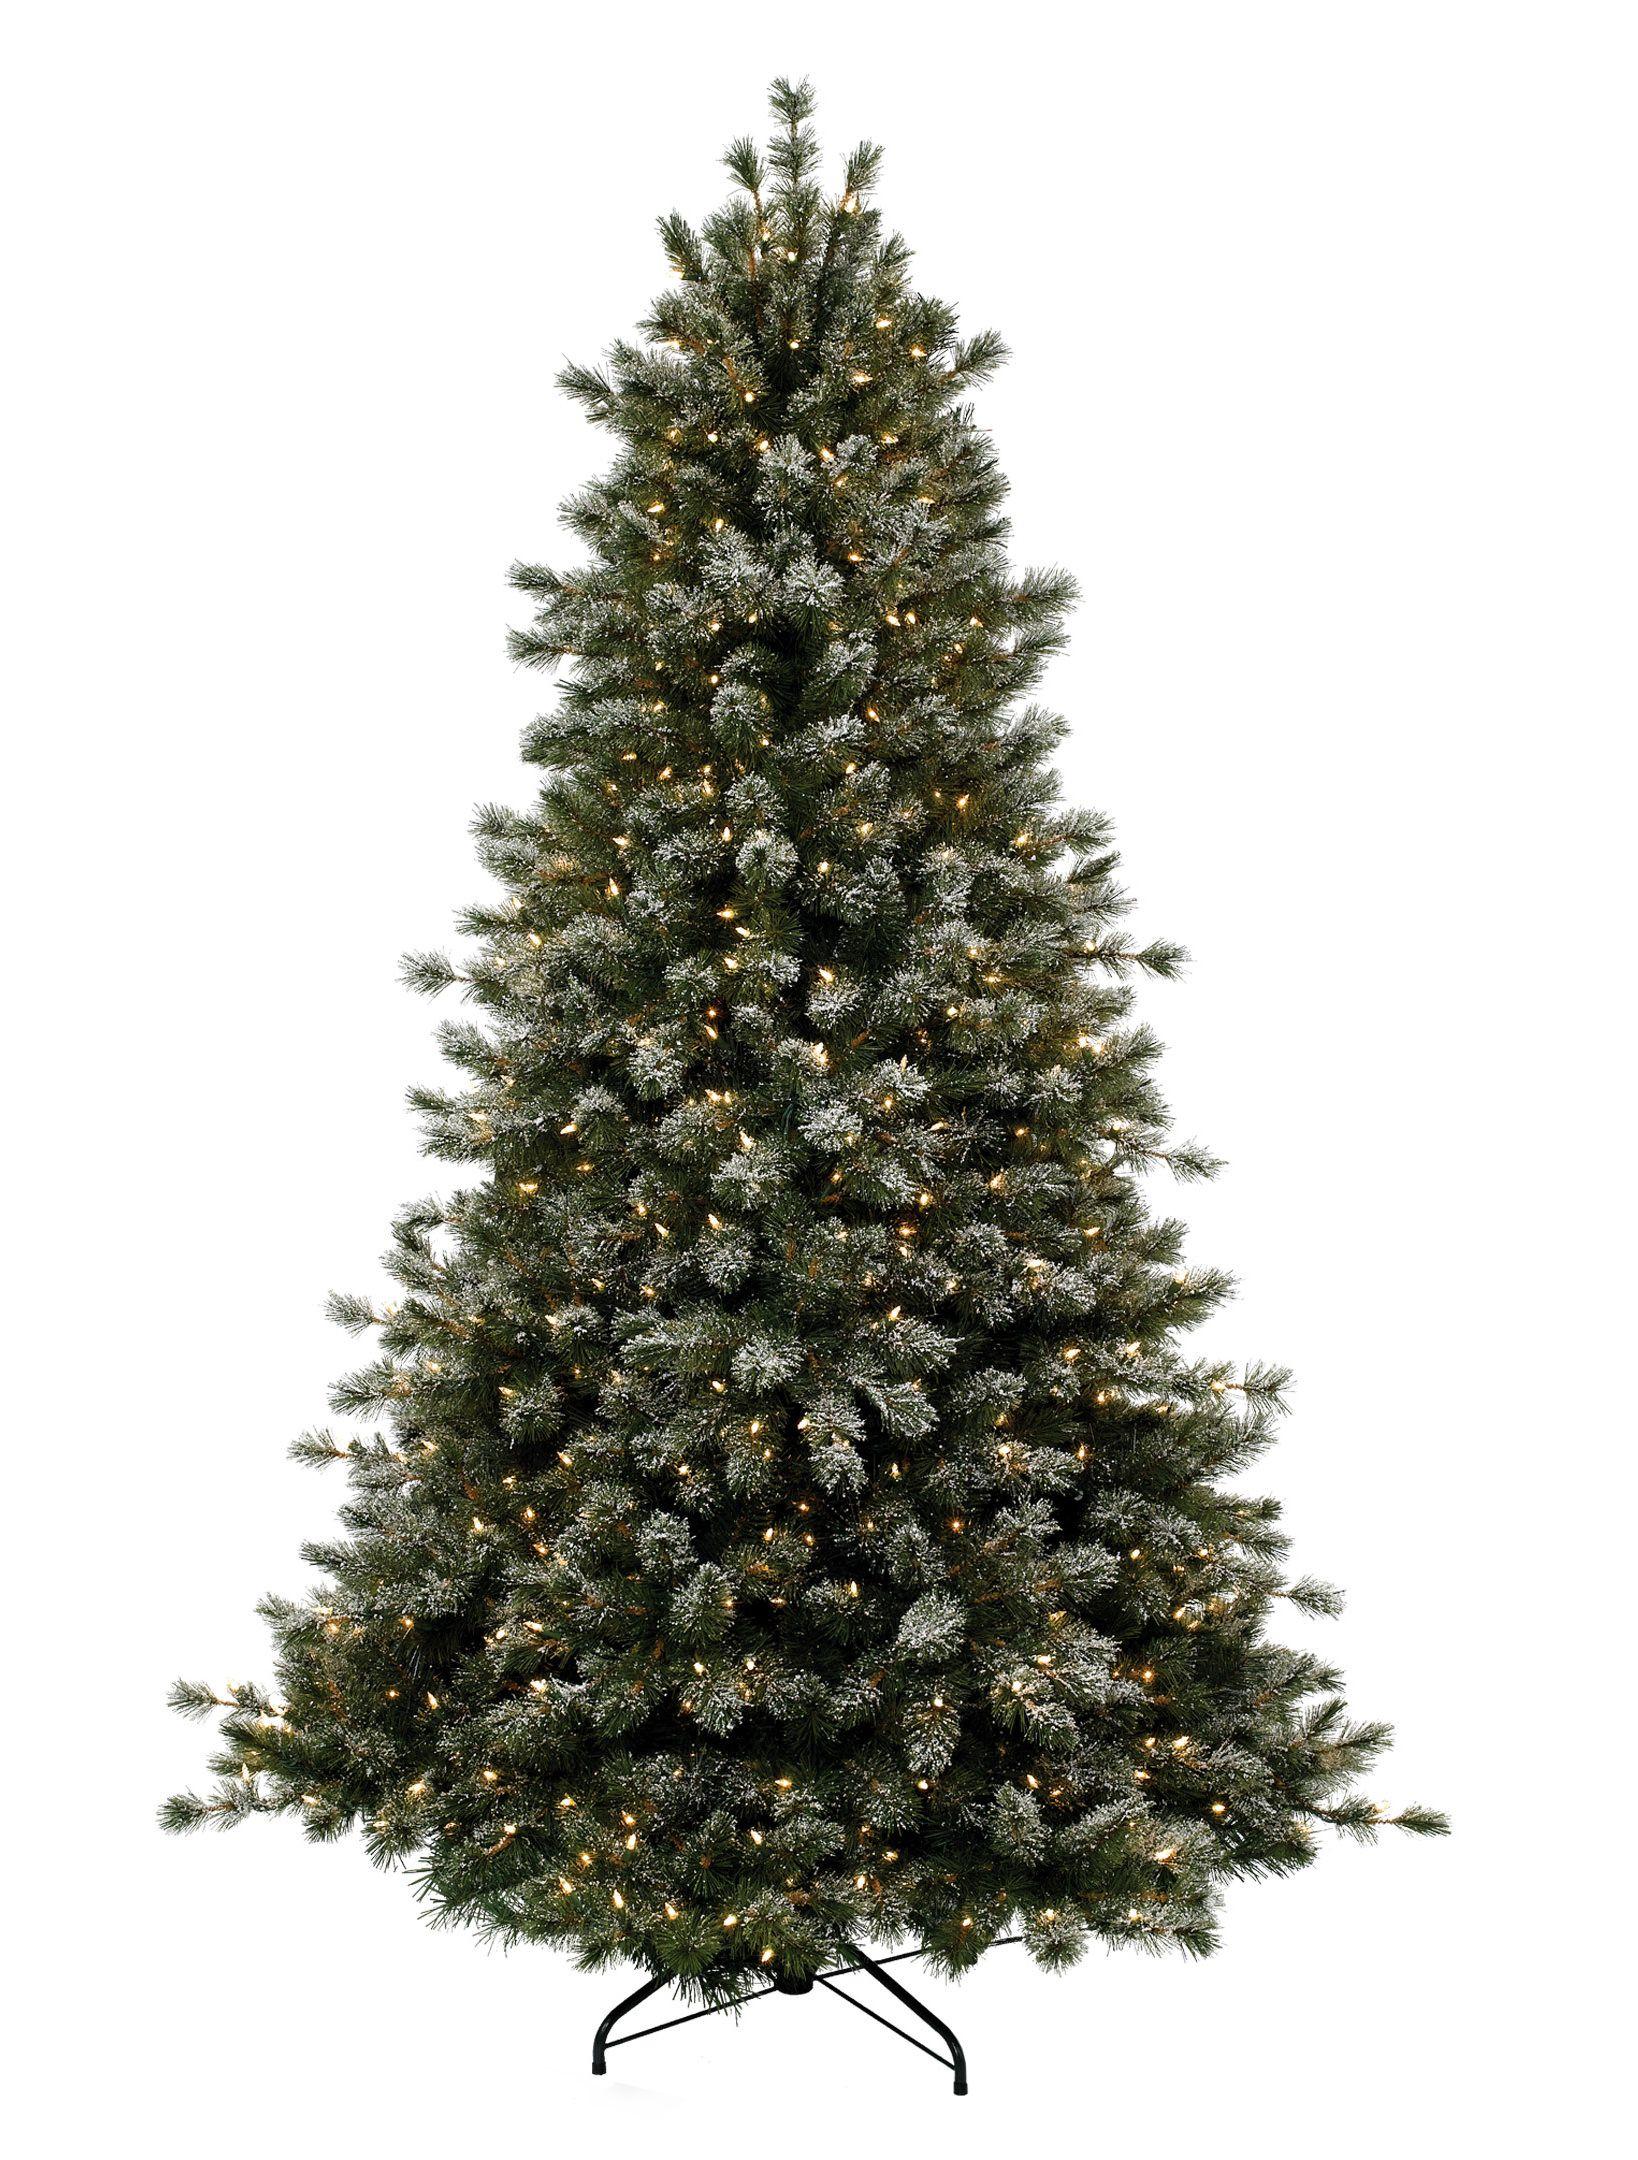 Sugar Pine Artificial Christmas Tree